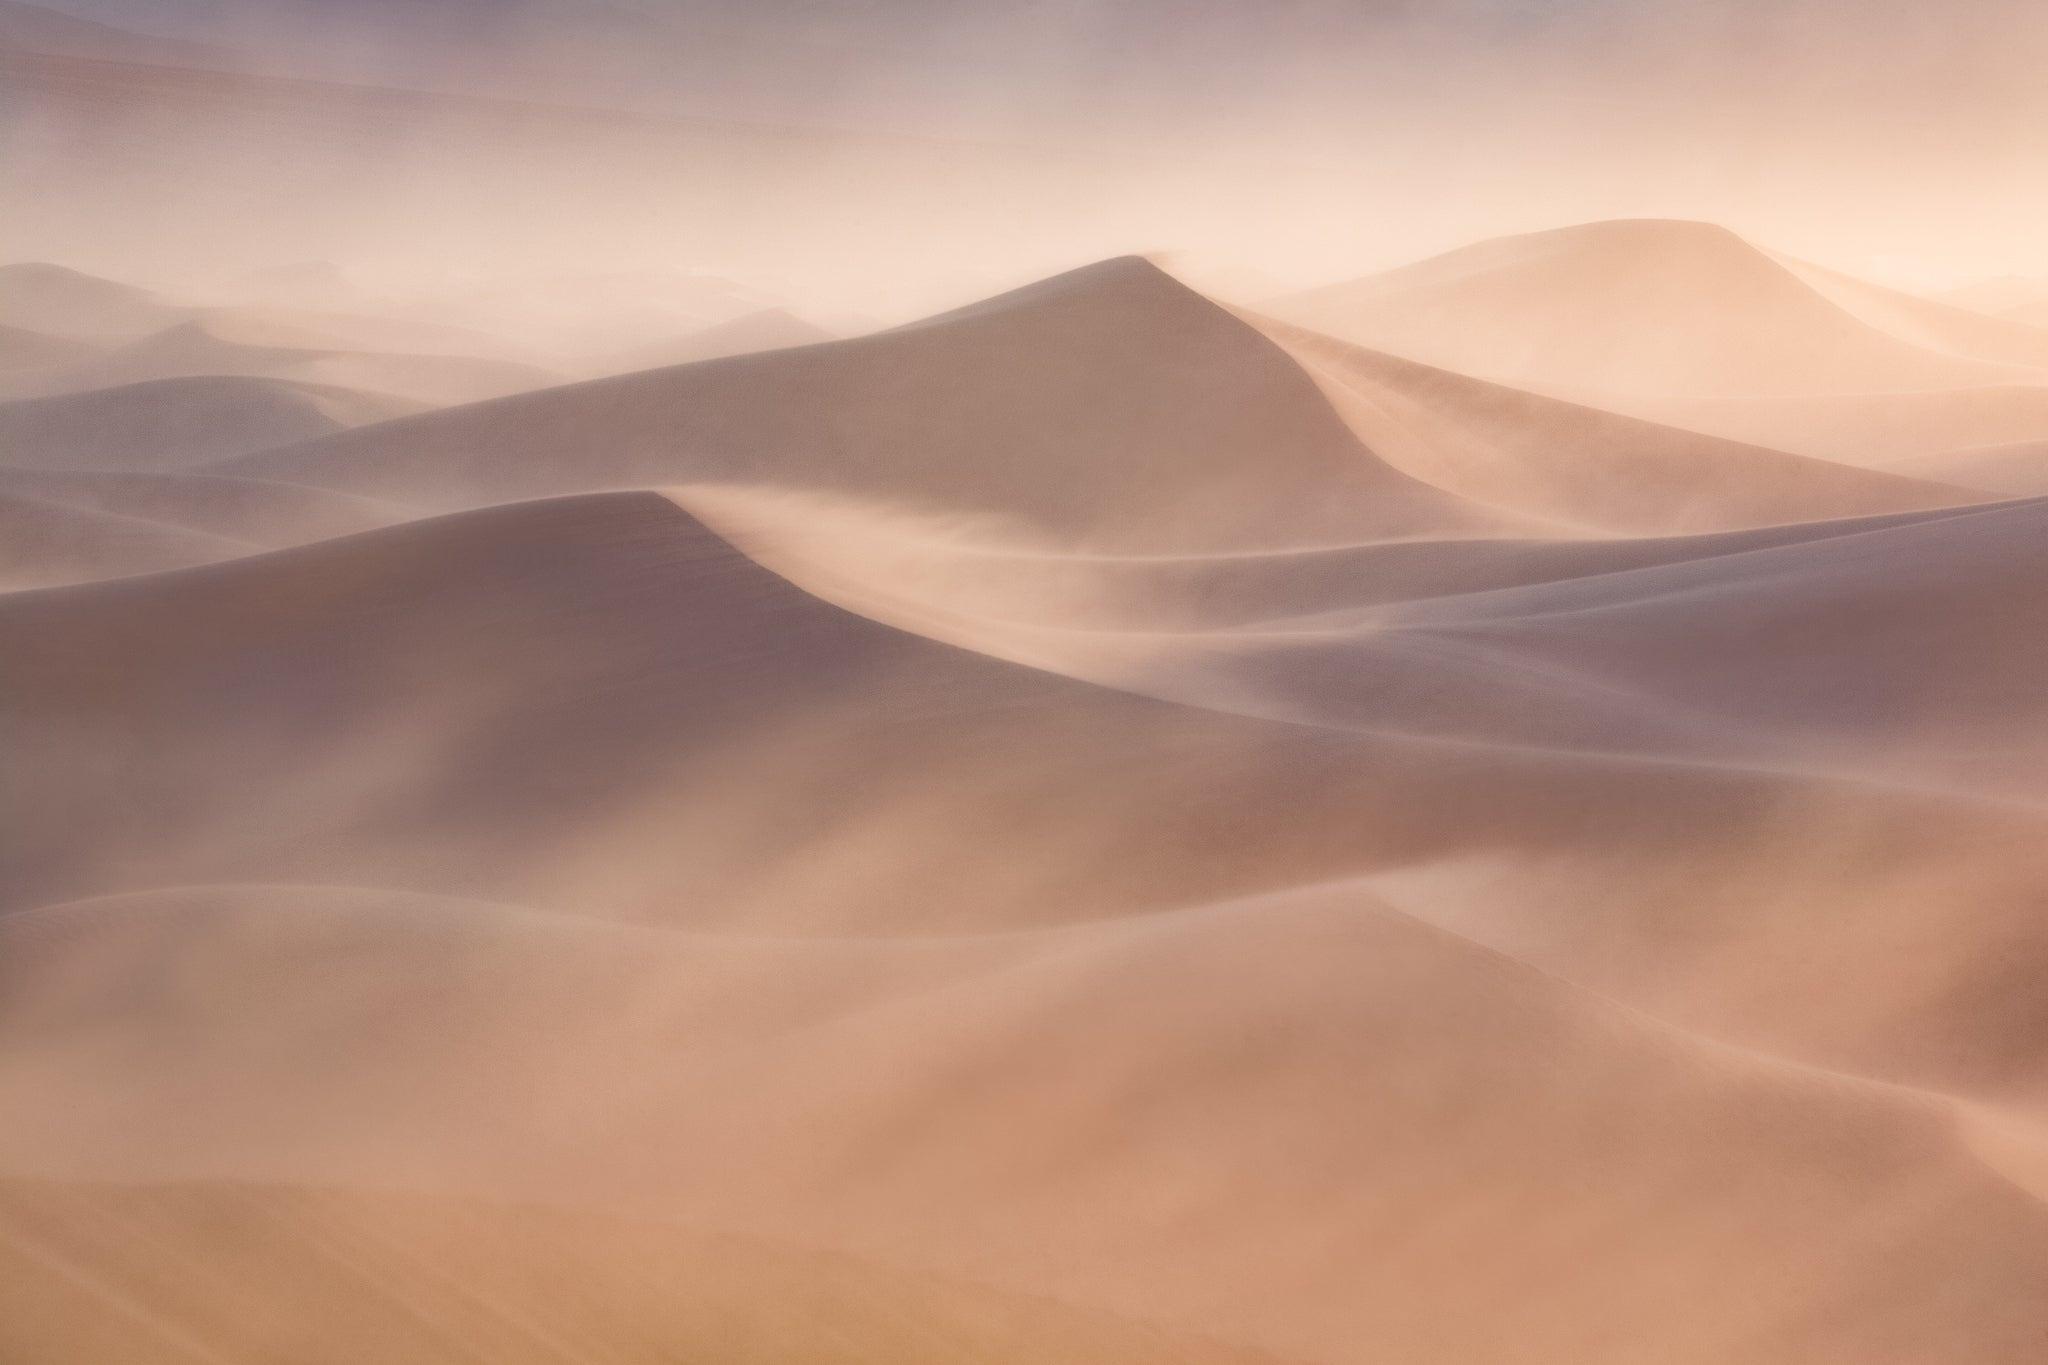 Death Valley National Park, California (2016)